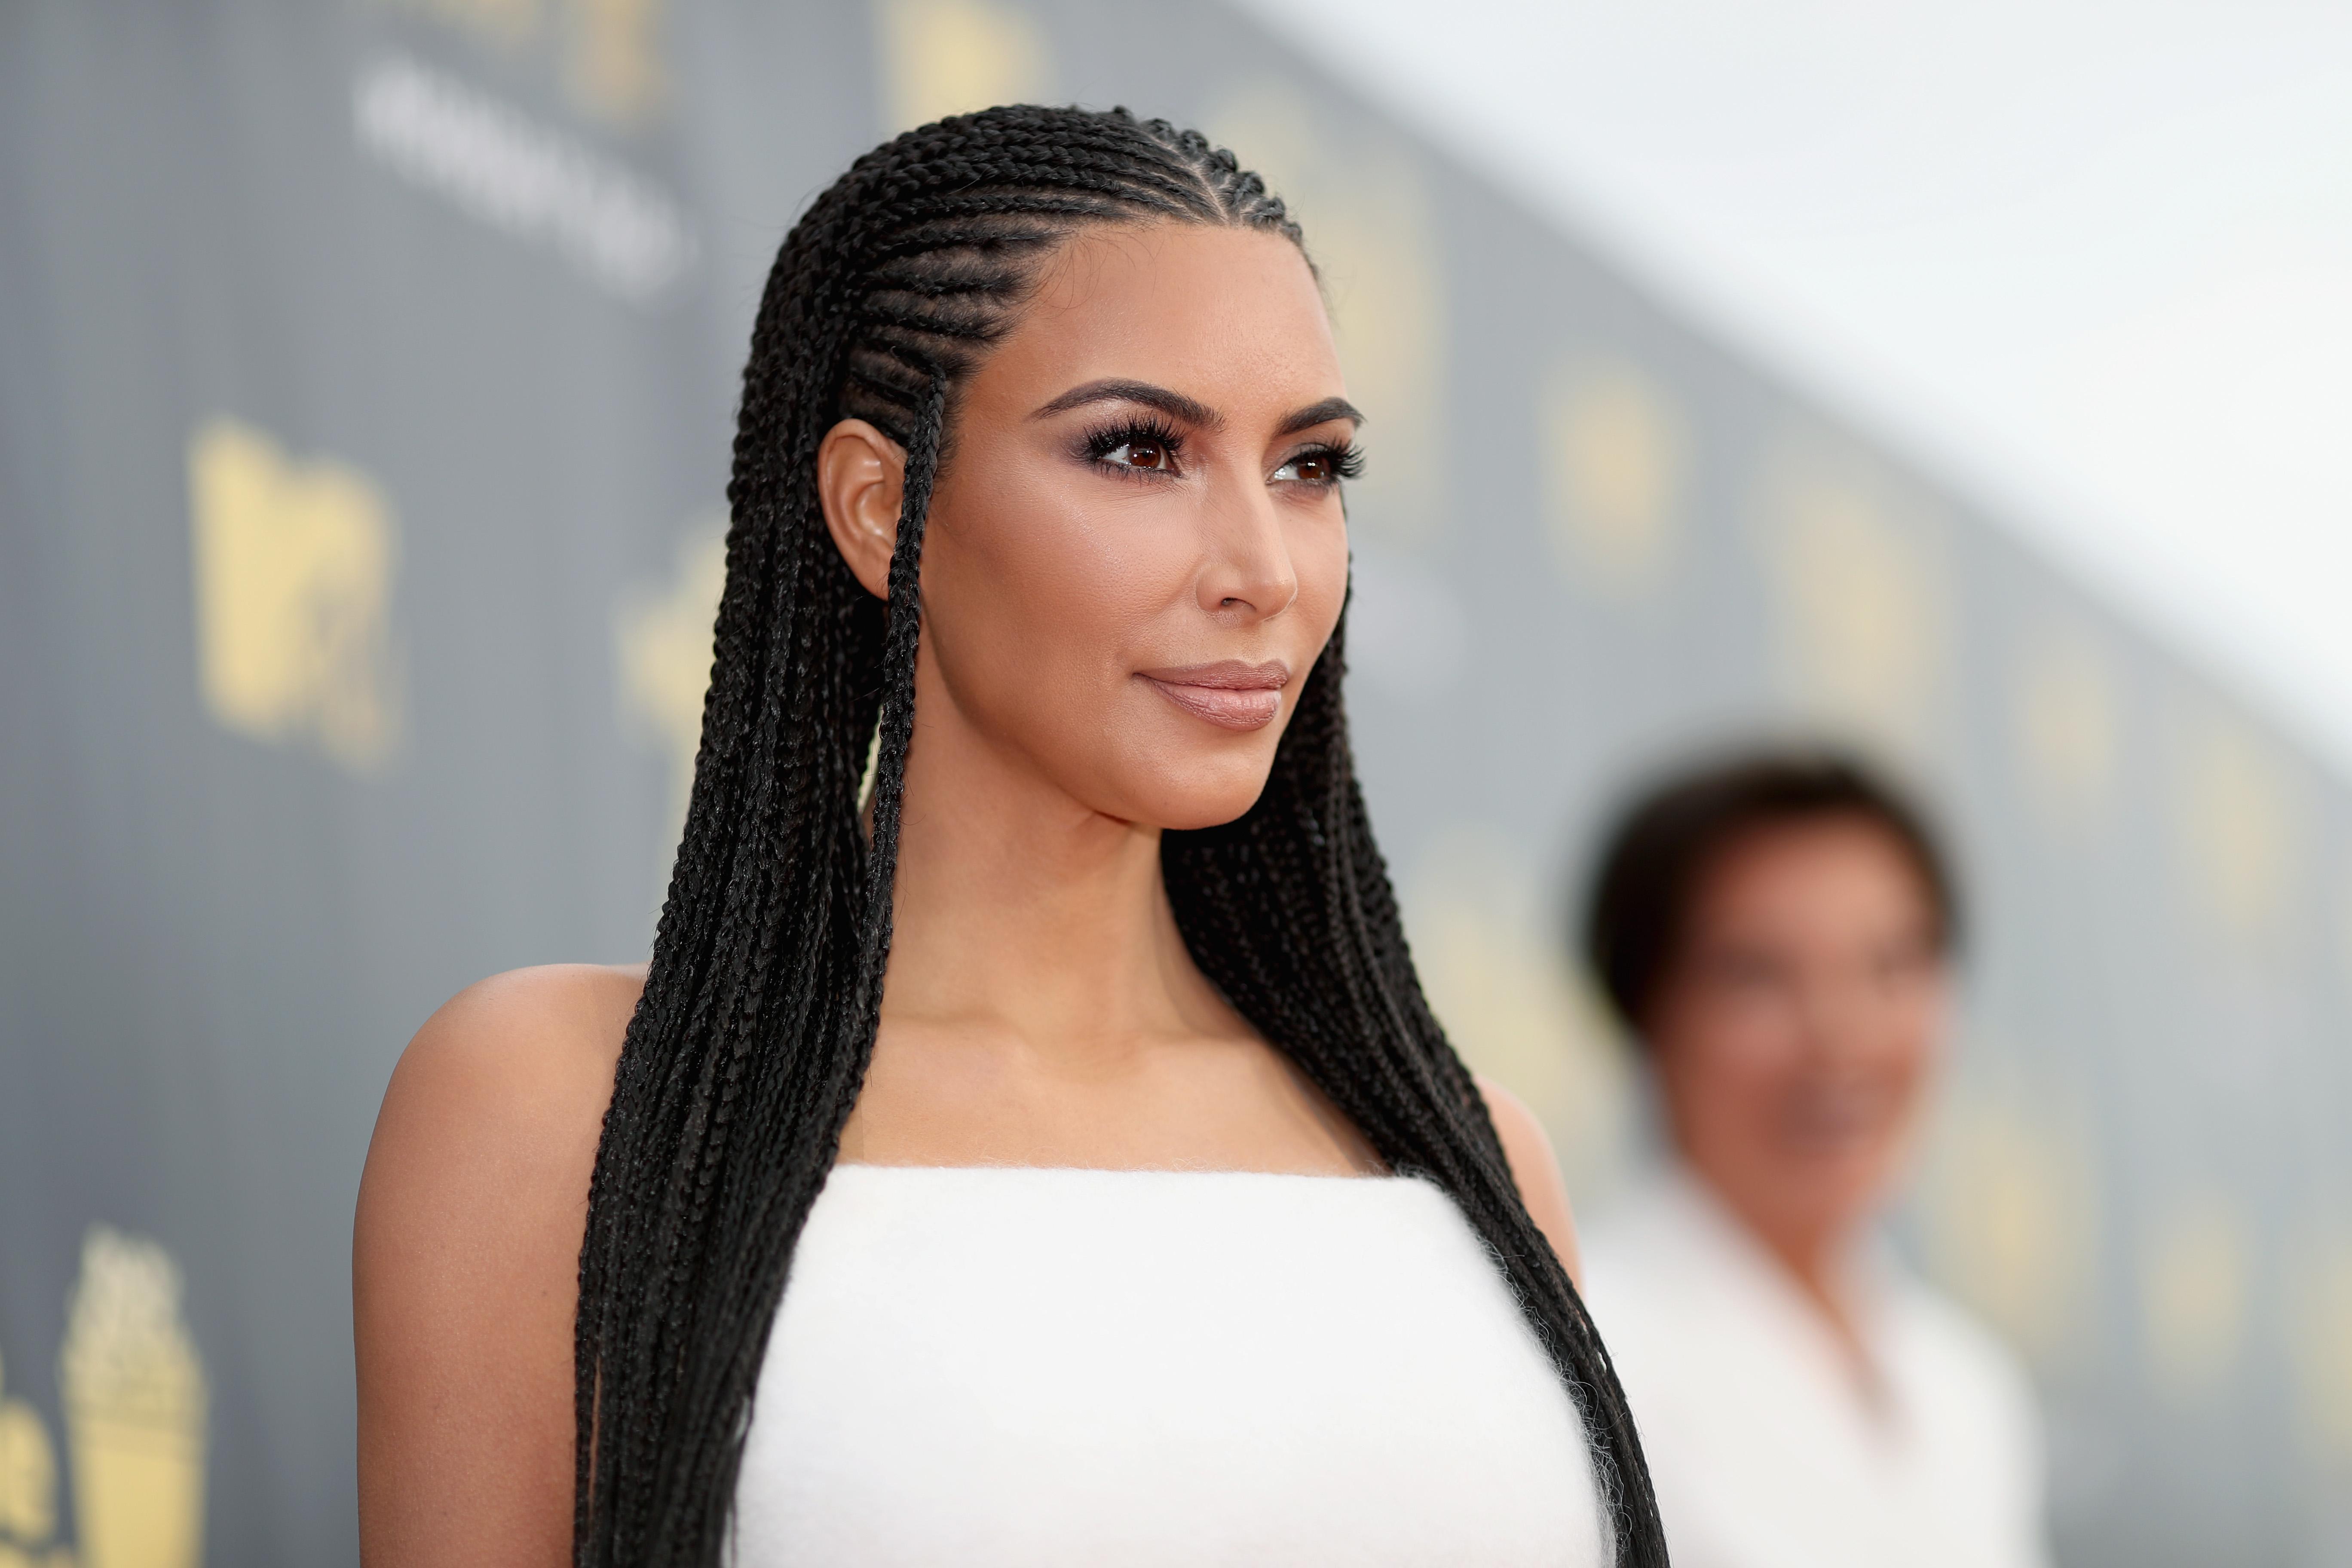 Kim Kardashian Explains Why She Thinks It's Okay For Her To Have Fulani Braids.